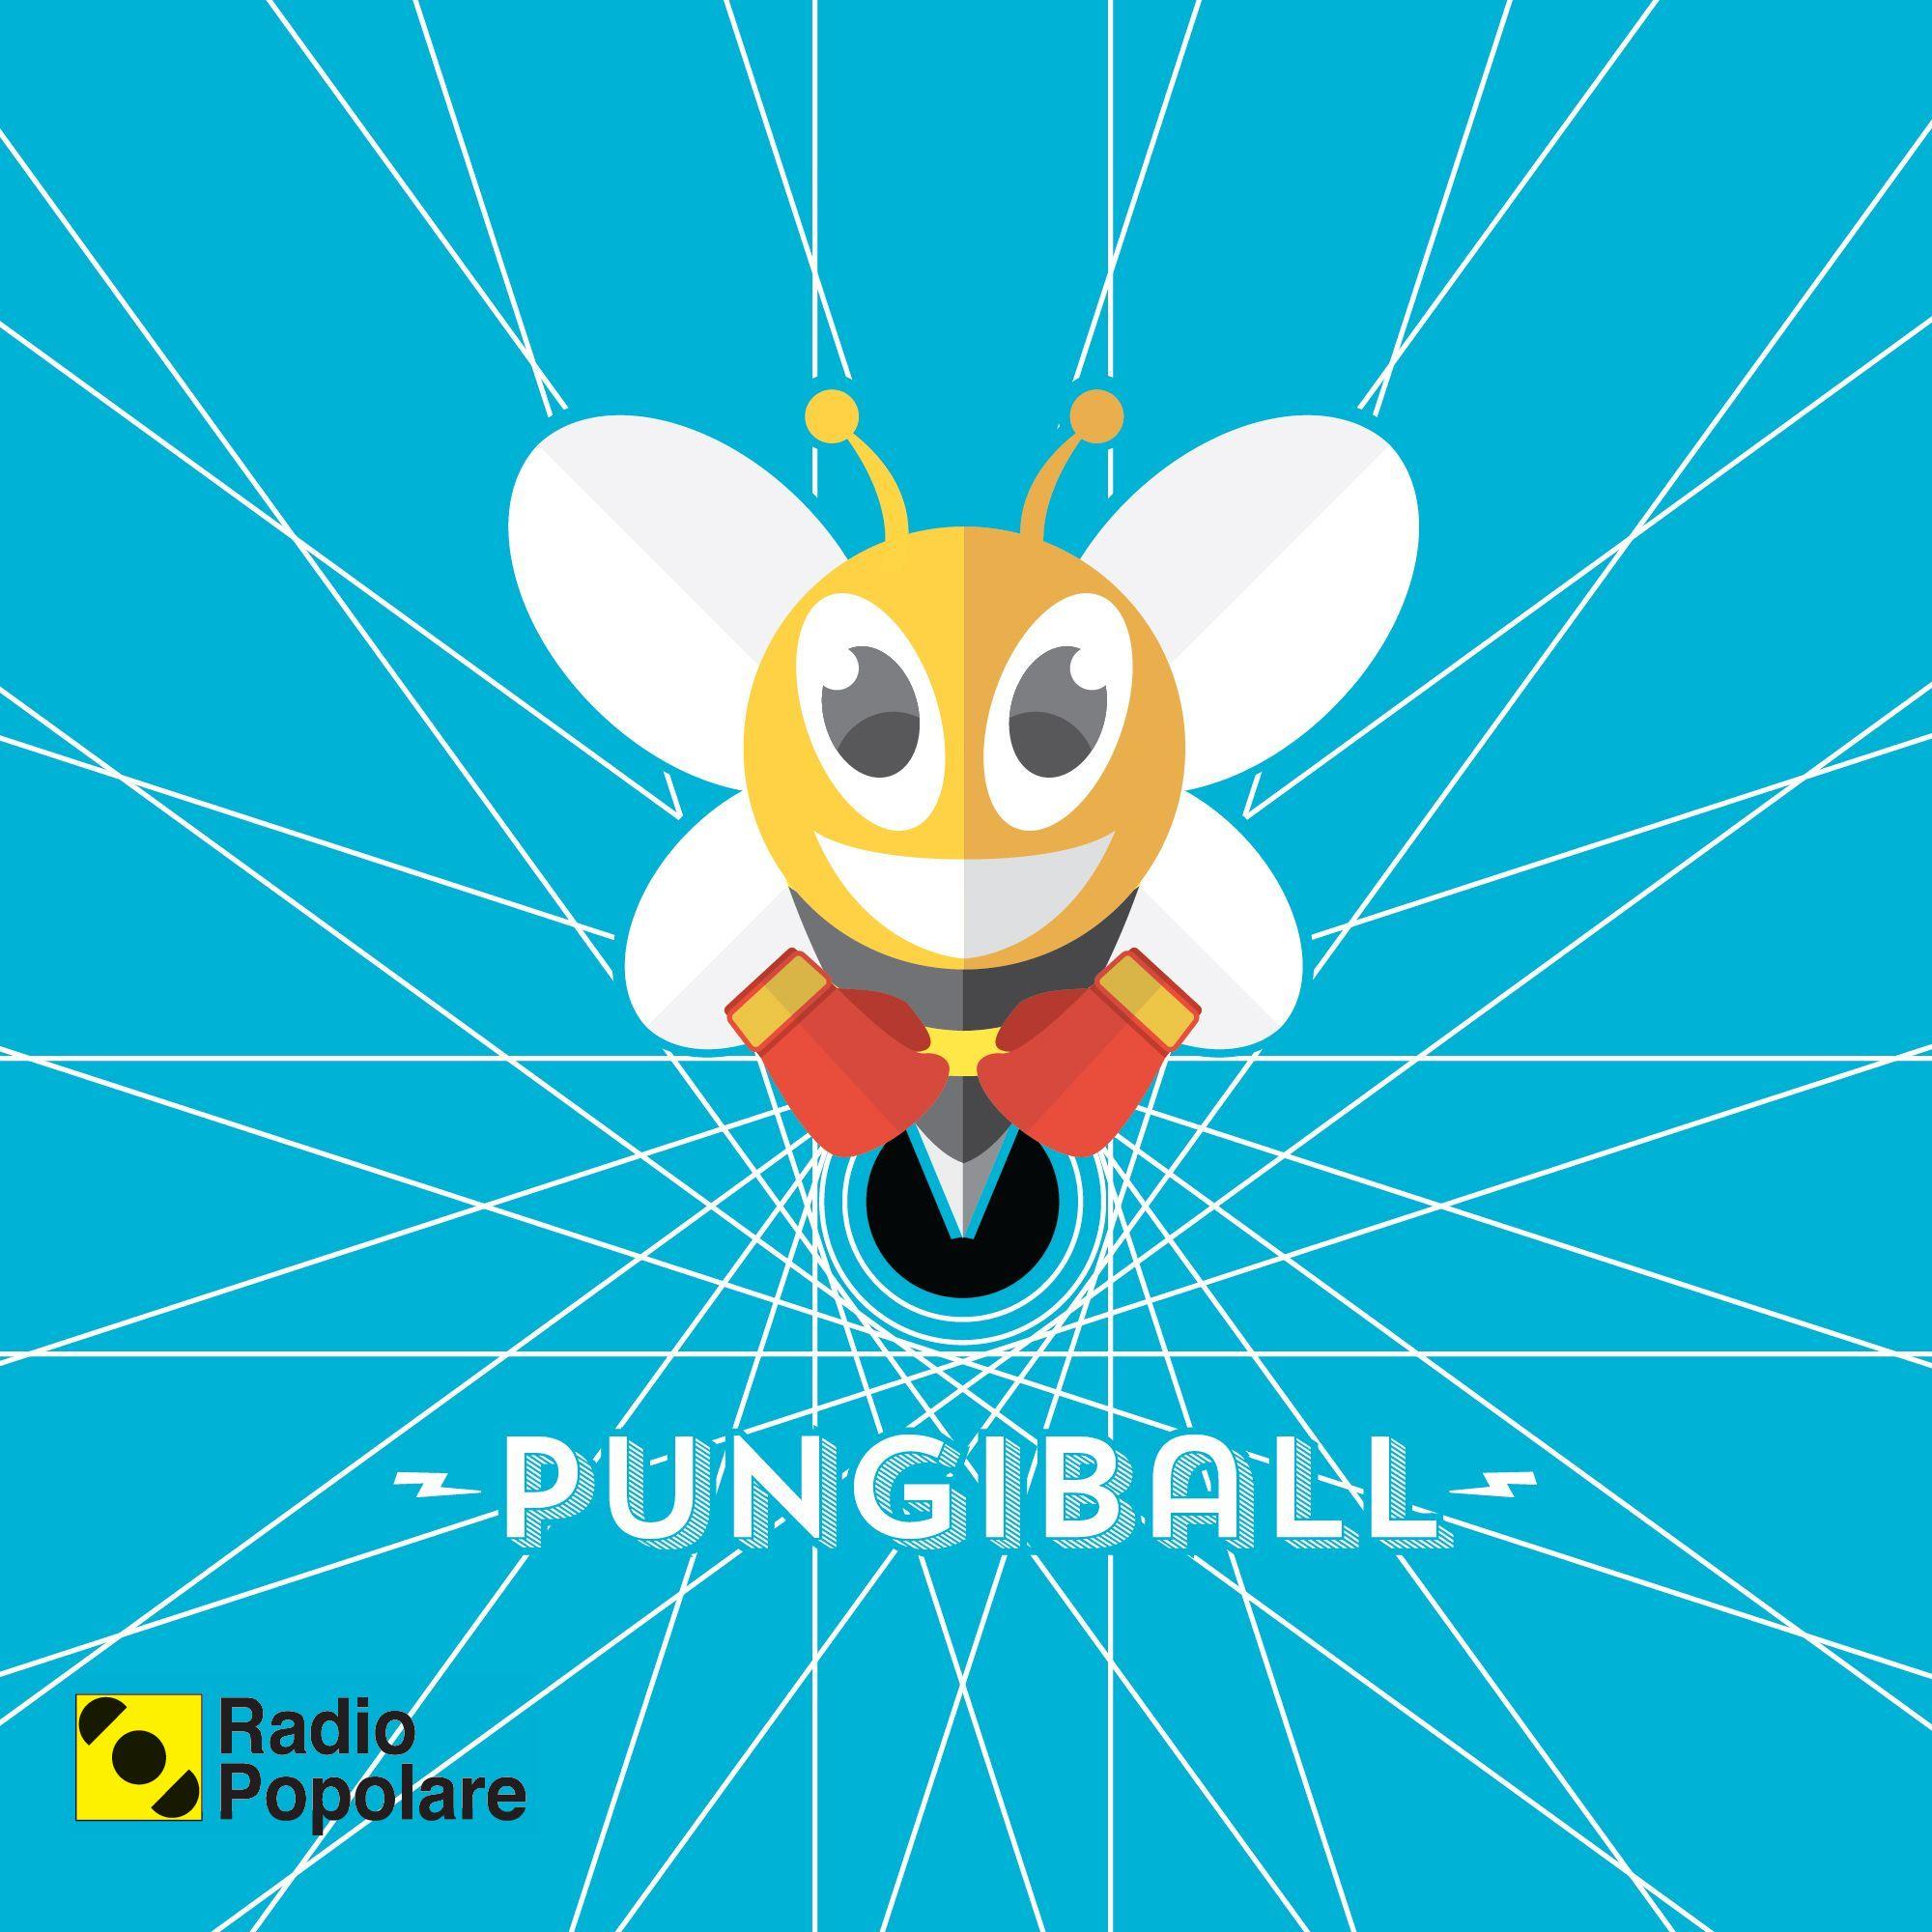 Pungiball - Radio Popolare